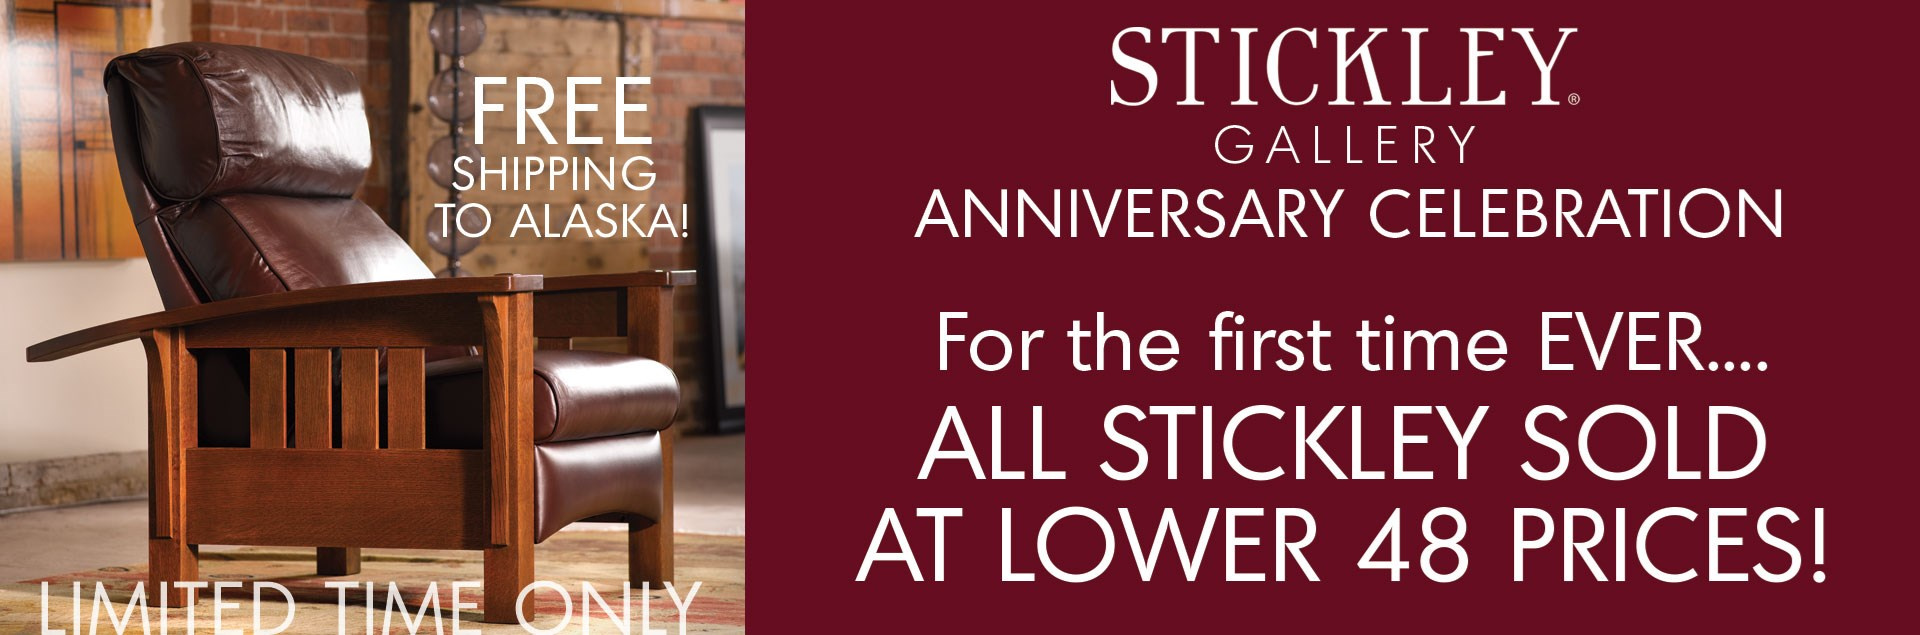 Stckley Anniversary Celebration